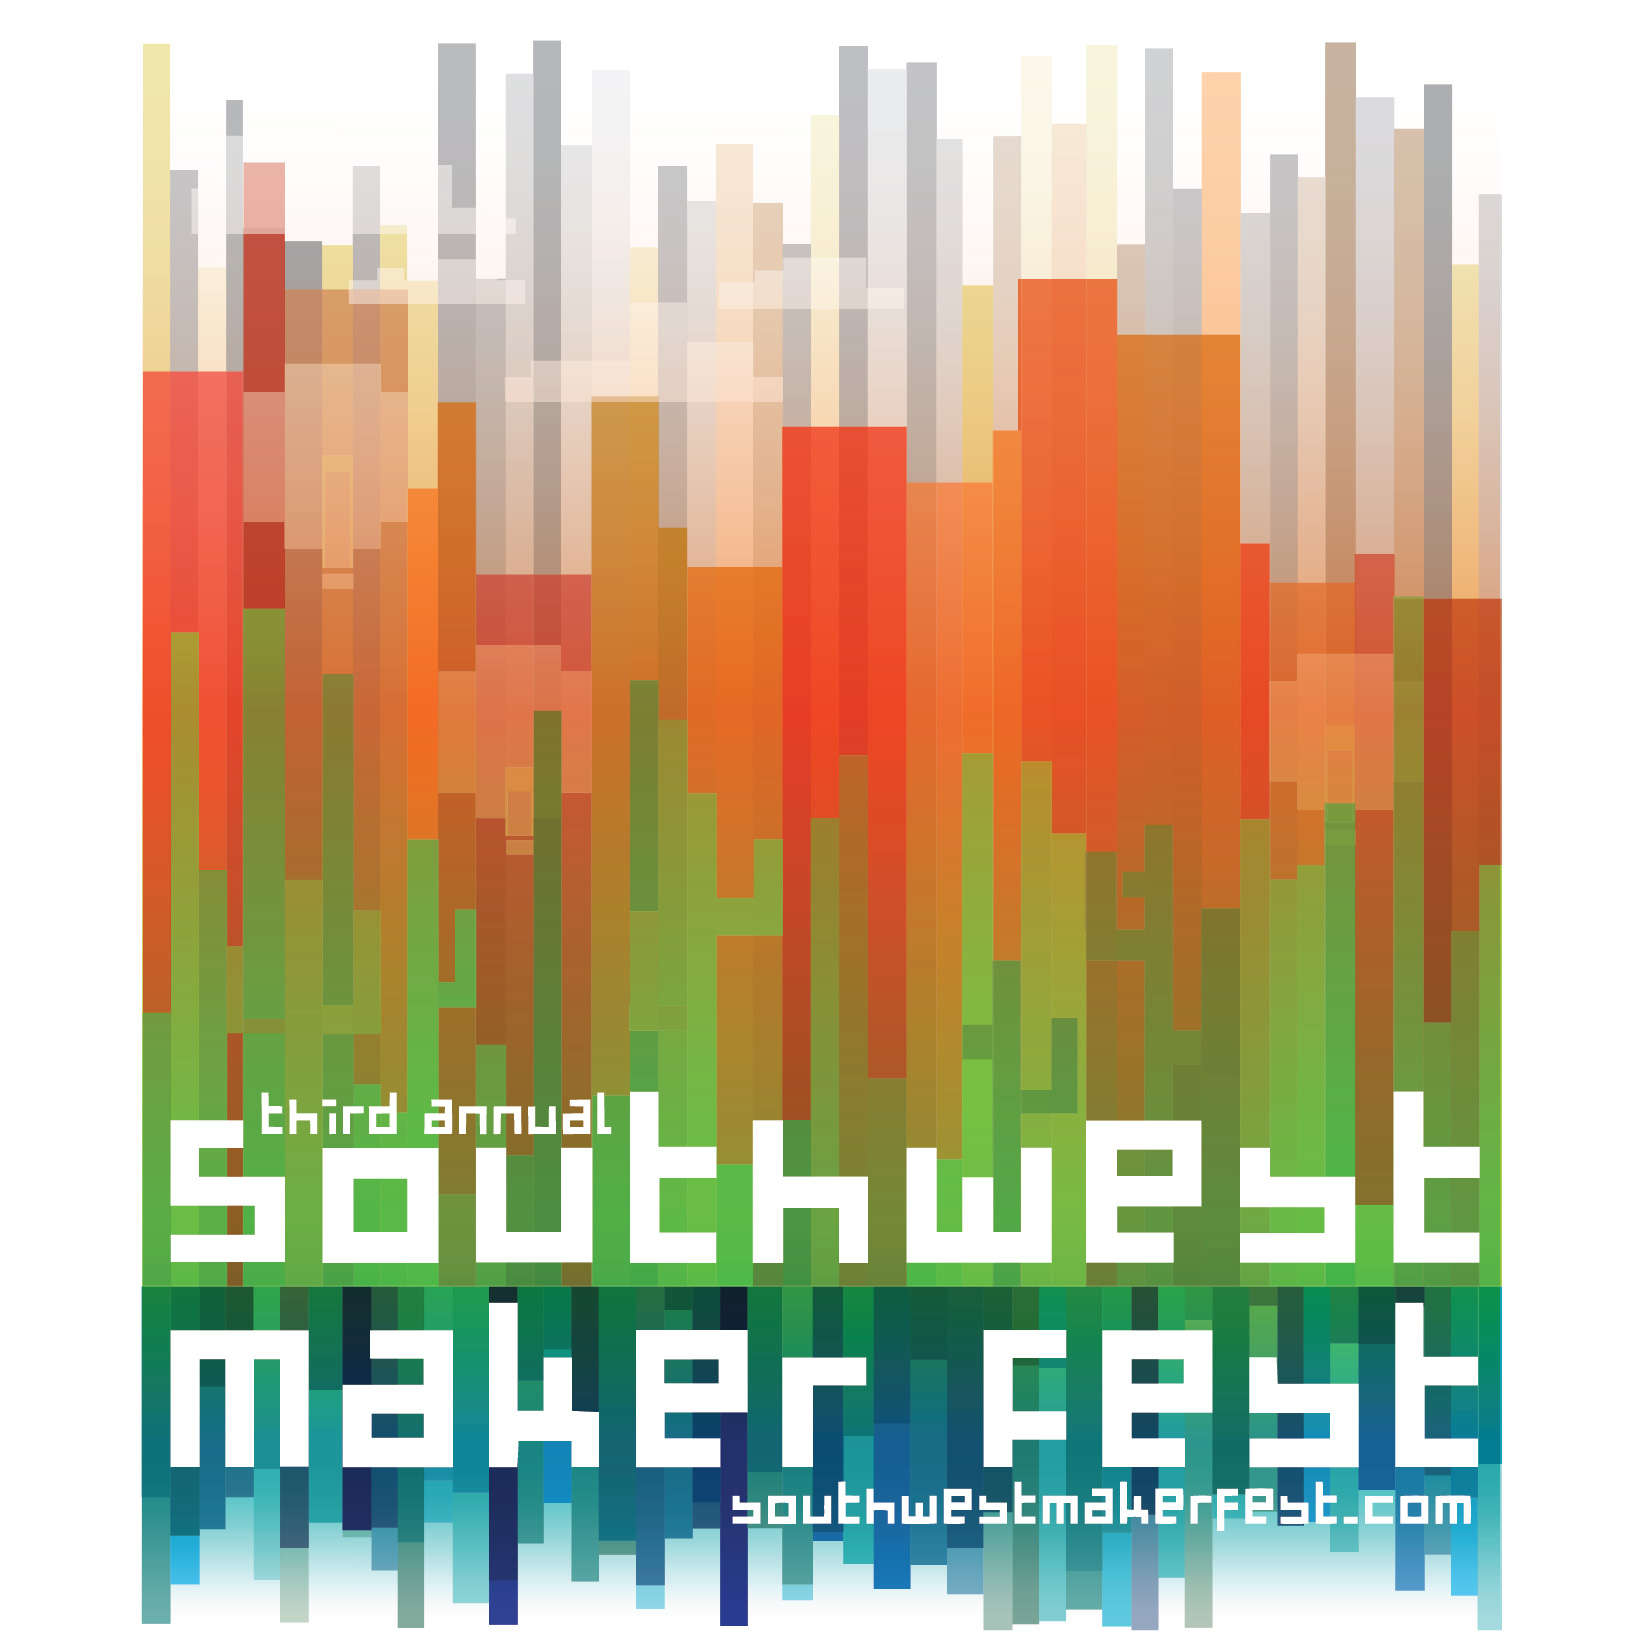 Southwest Maker Fest Poster Design Contest